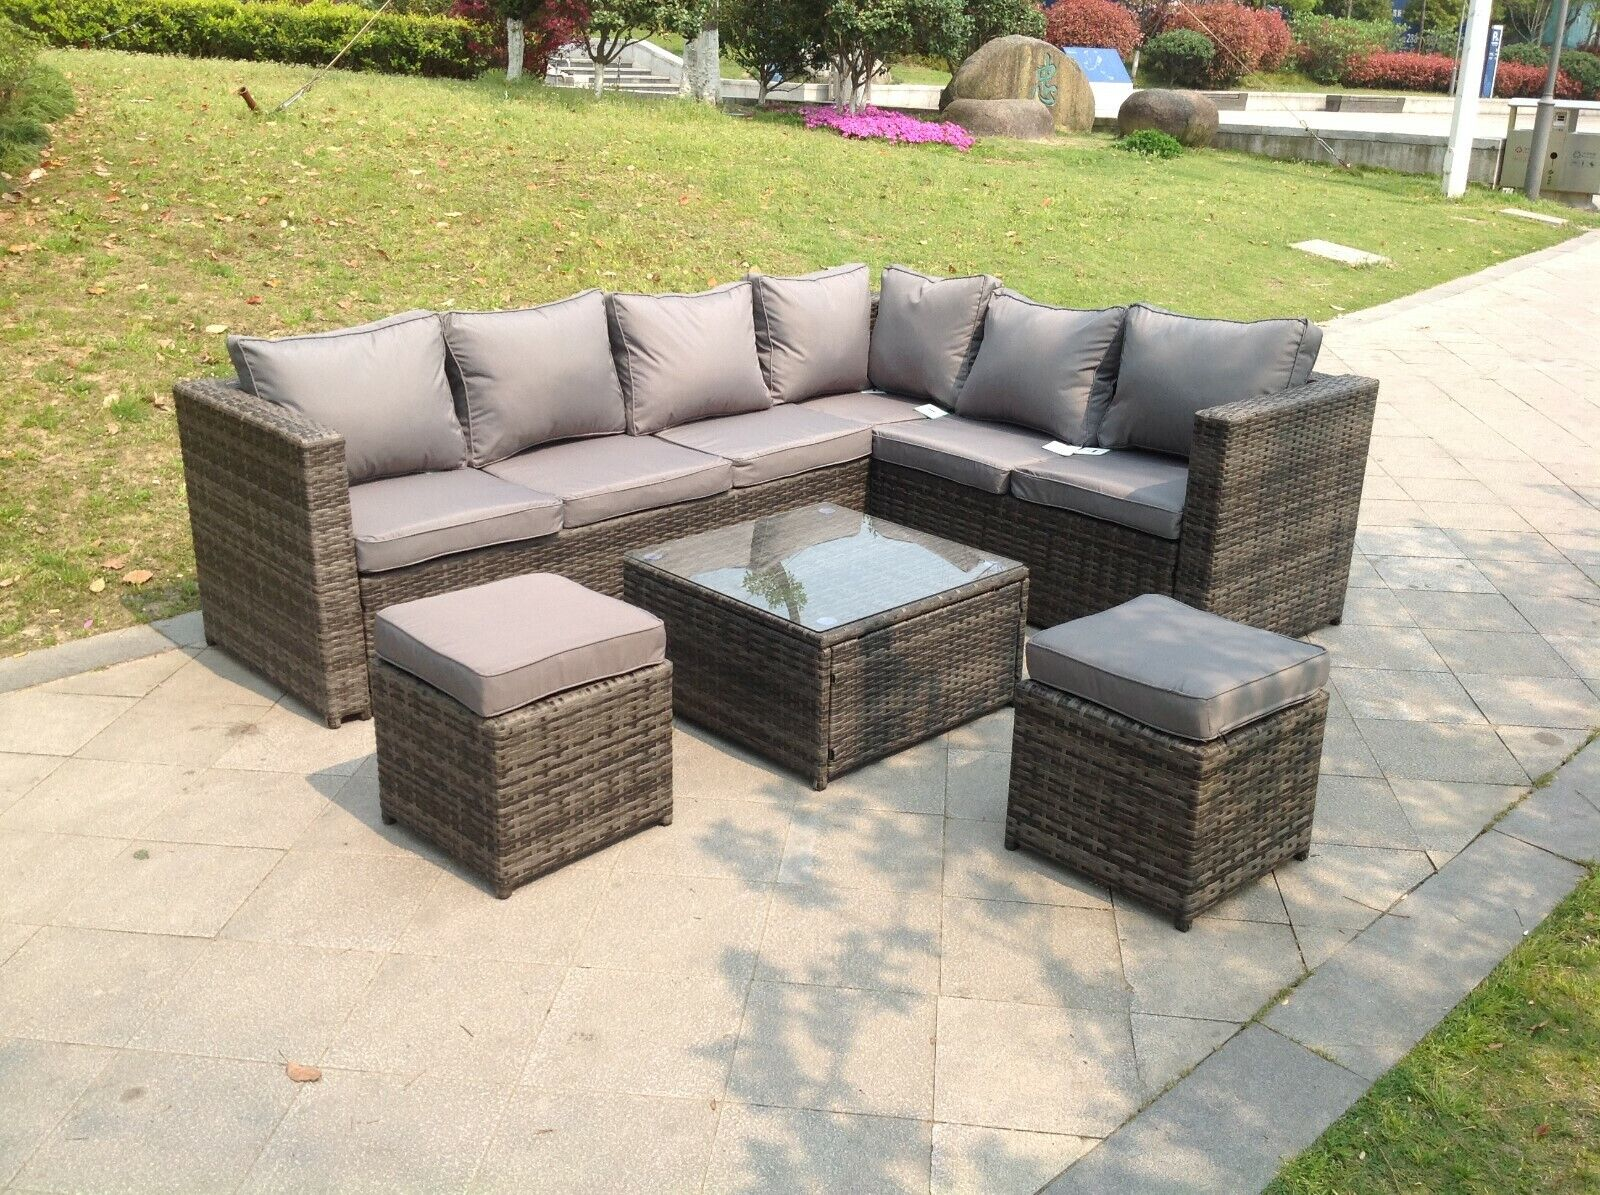 Garden Furniture - Grey rattan corner sofa set  with footstool 8 seater outdoor garden furniture